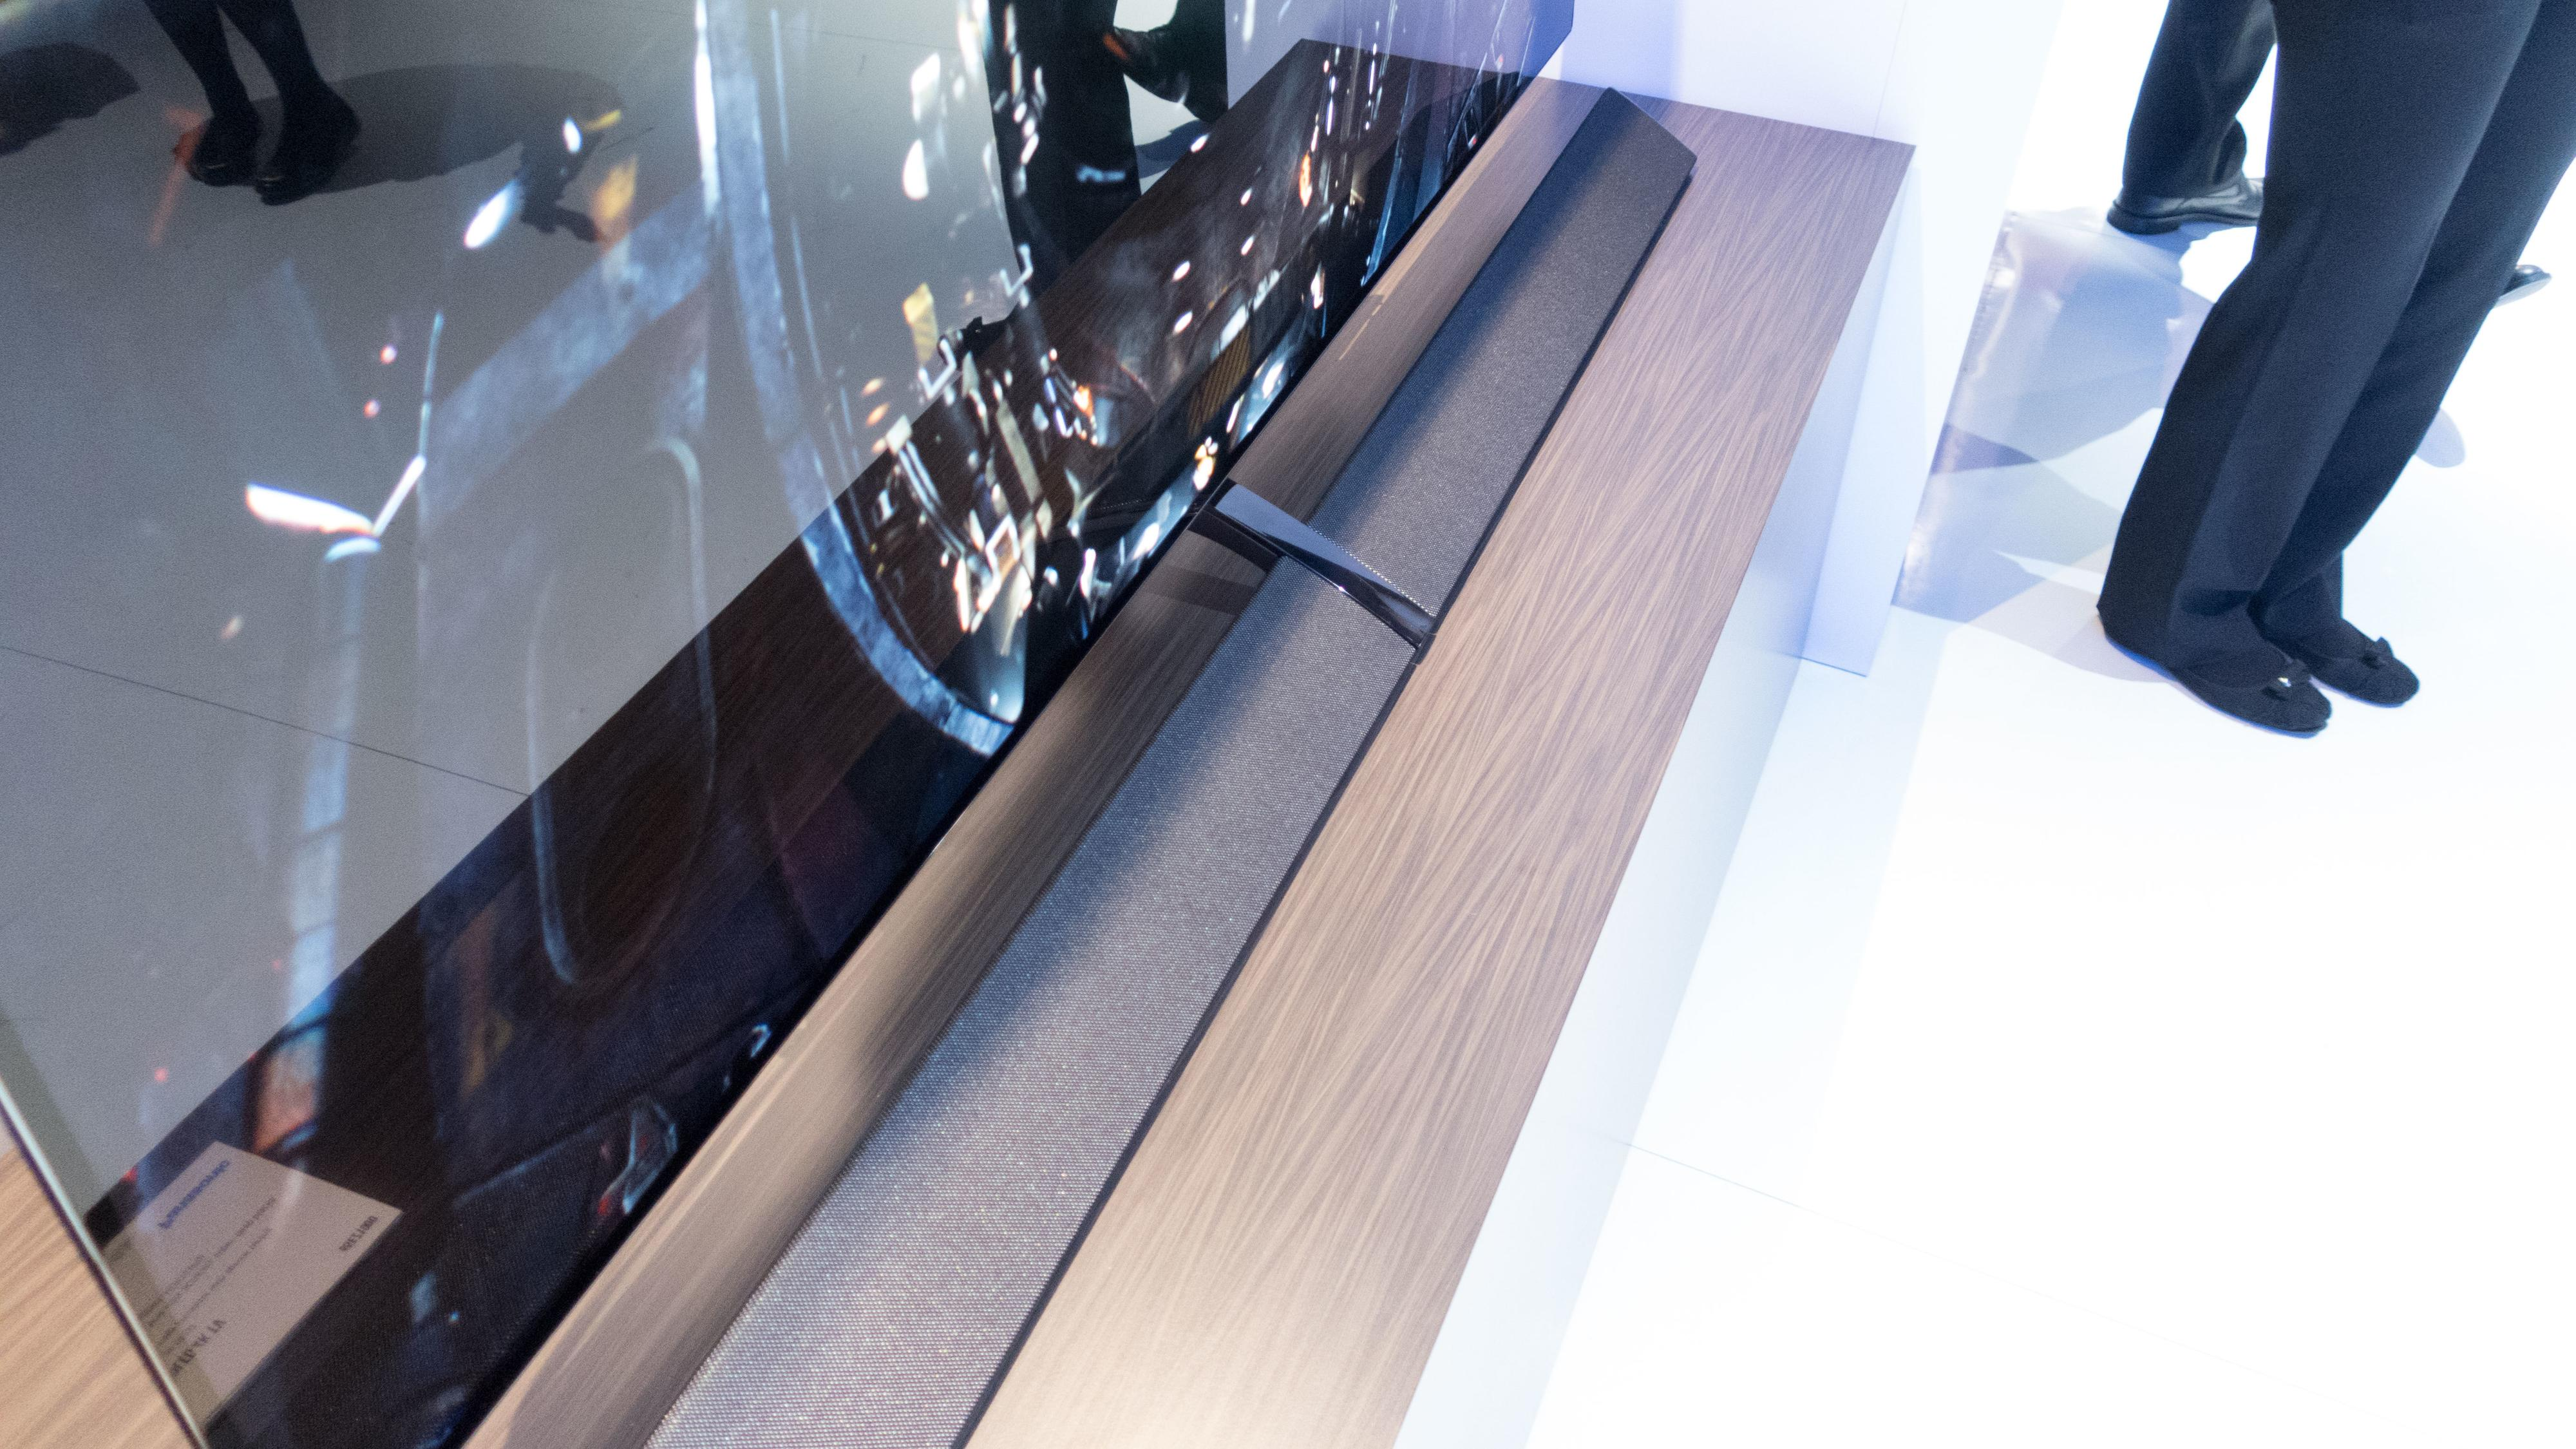 Foten til denne TV-en er også en lydplanke.